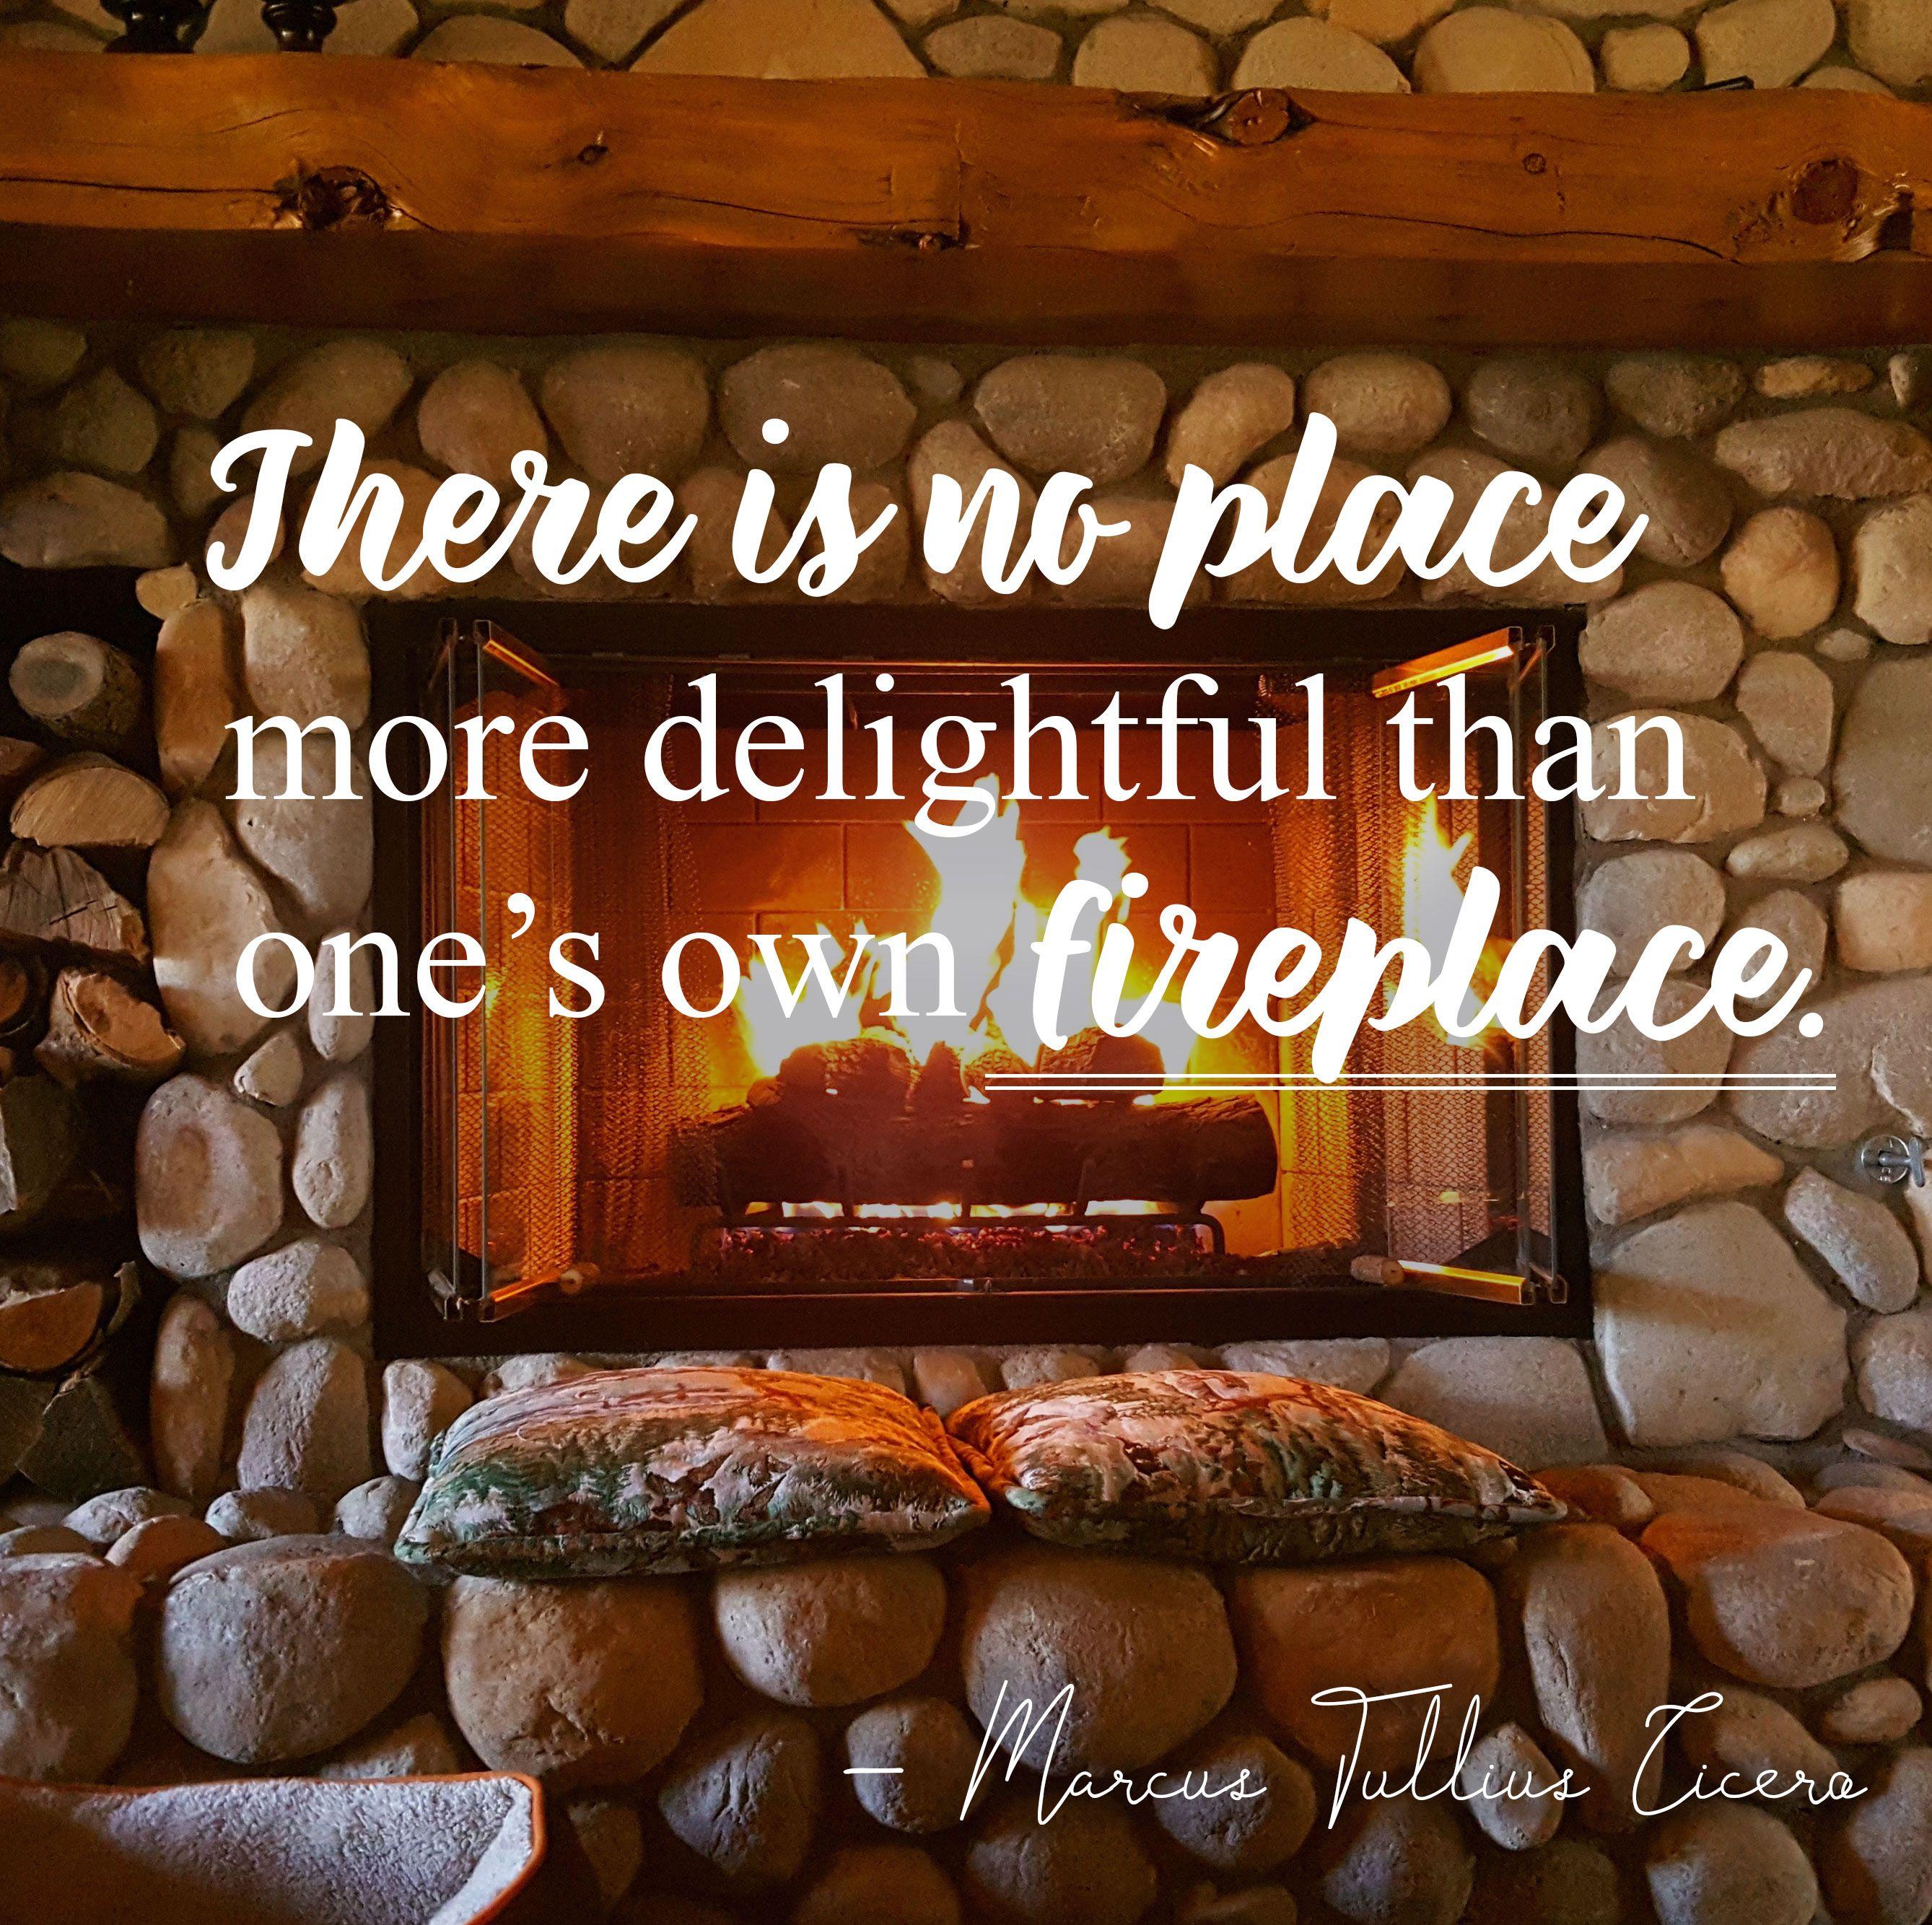 There Is No Place More Delightful Then One S Own Fireplace Marcus Tullius Cicero Ni Prostora Bolj Prijetnega Inspirational Quotes Best Quotes Cicero